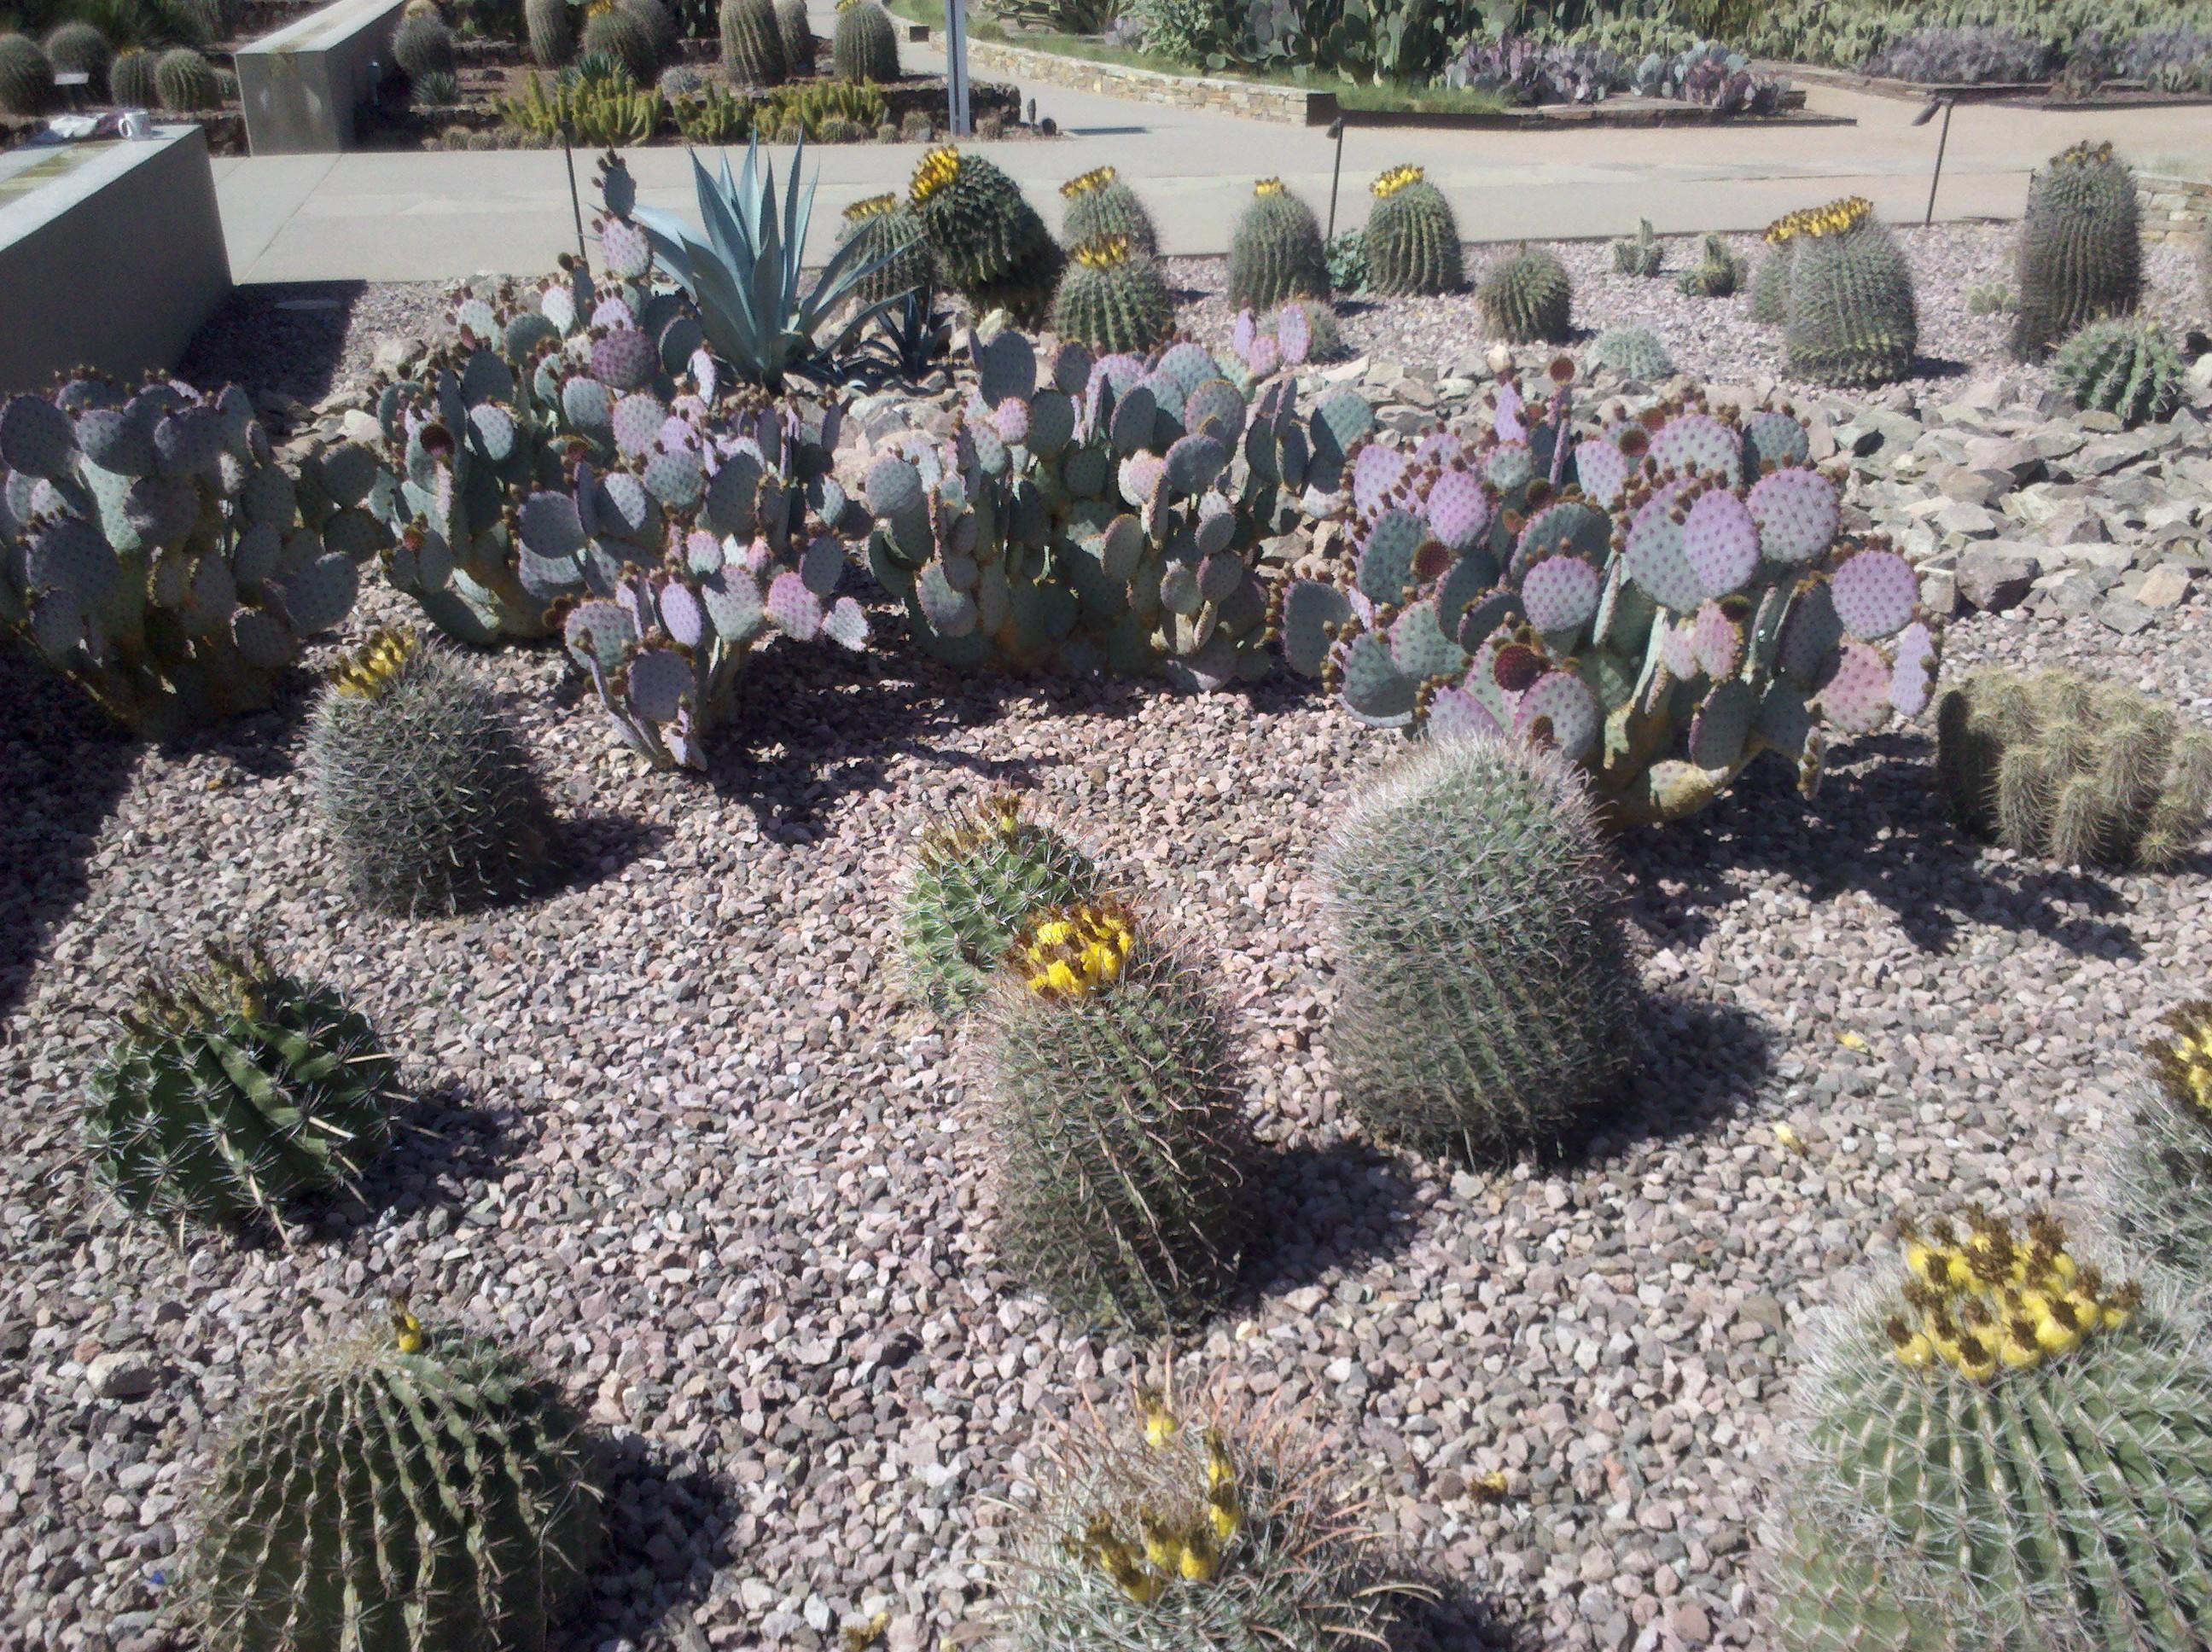 Barrel Cactus And Prickly Pear Cactus At Desert Botanical Gardens, Phoenix,  AZ